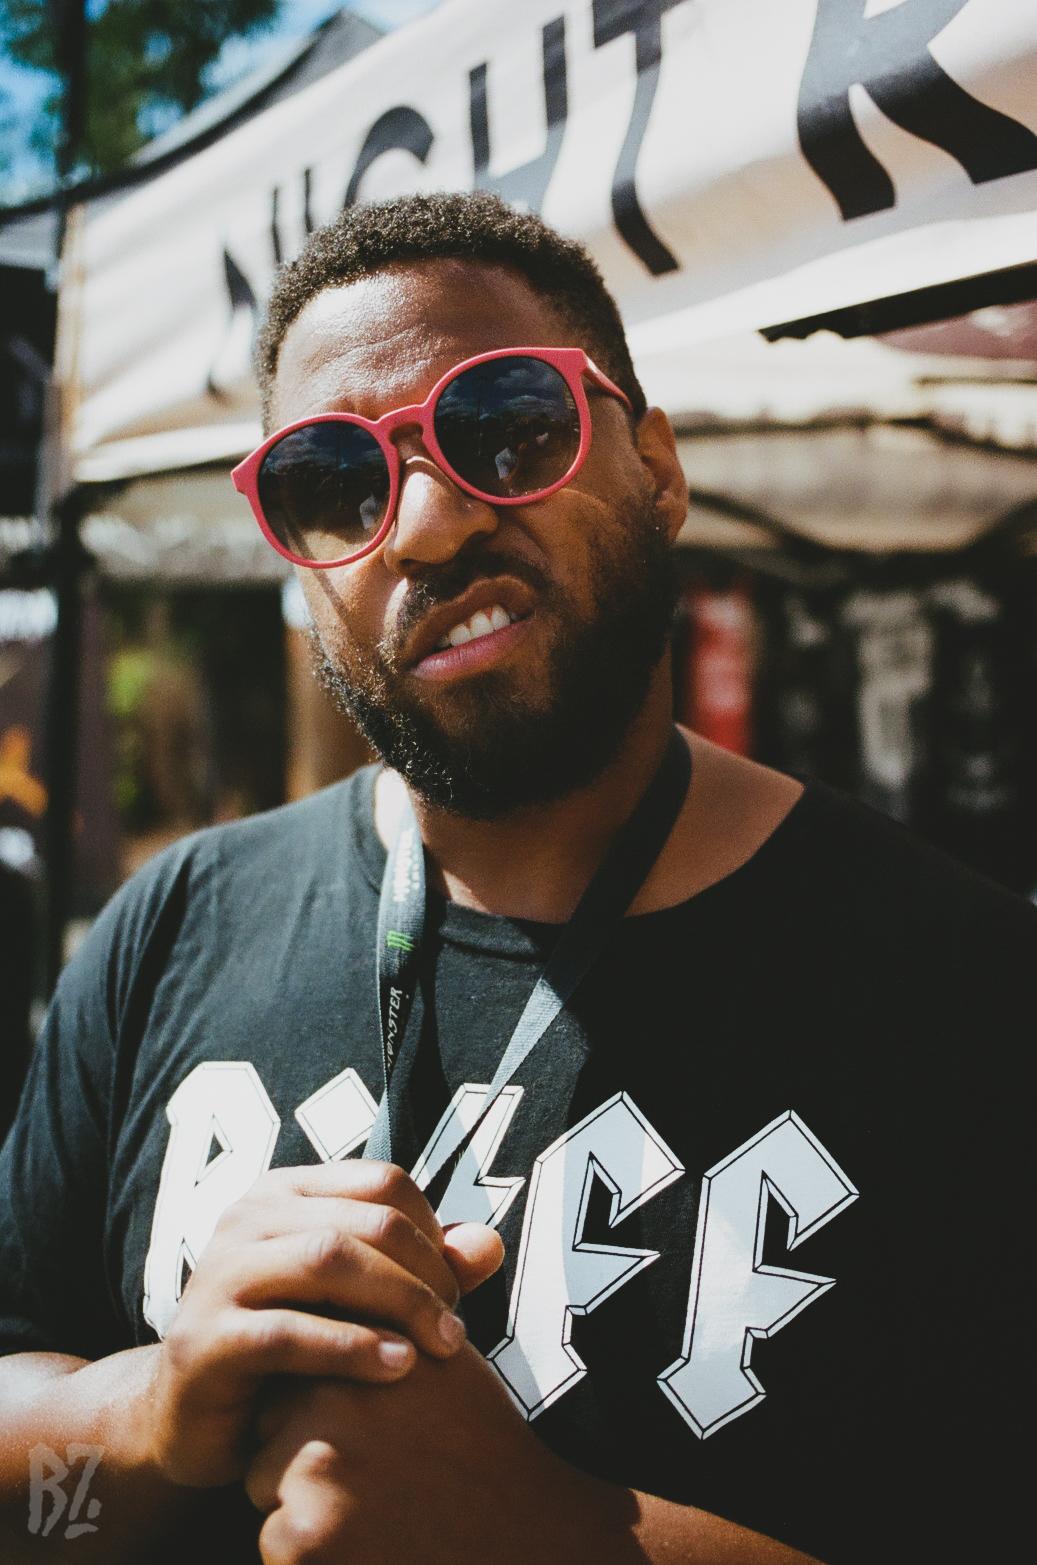 Travis | Merch for Riff Raff